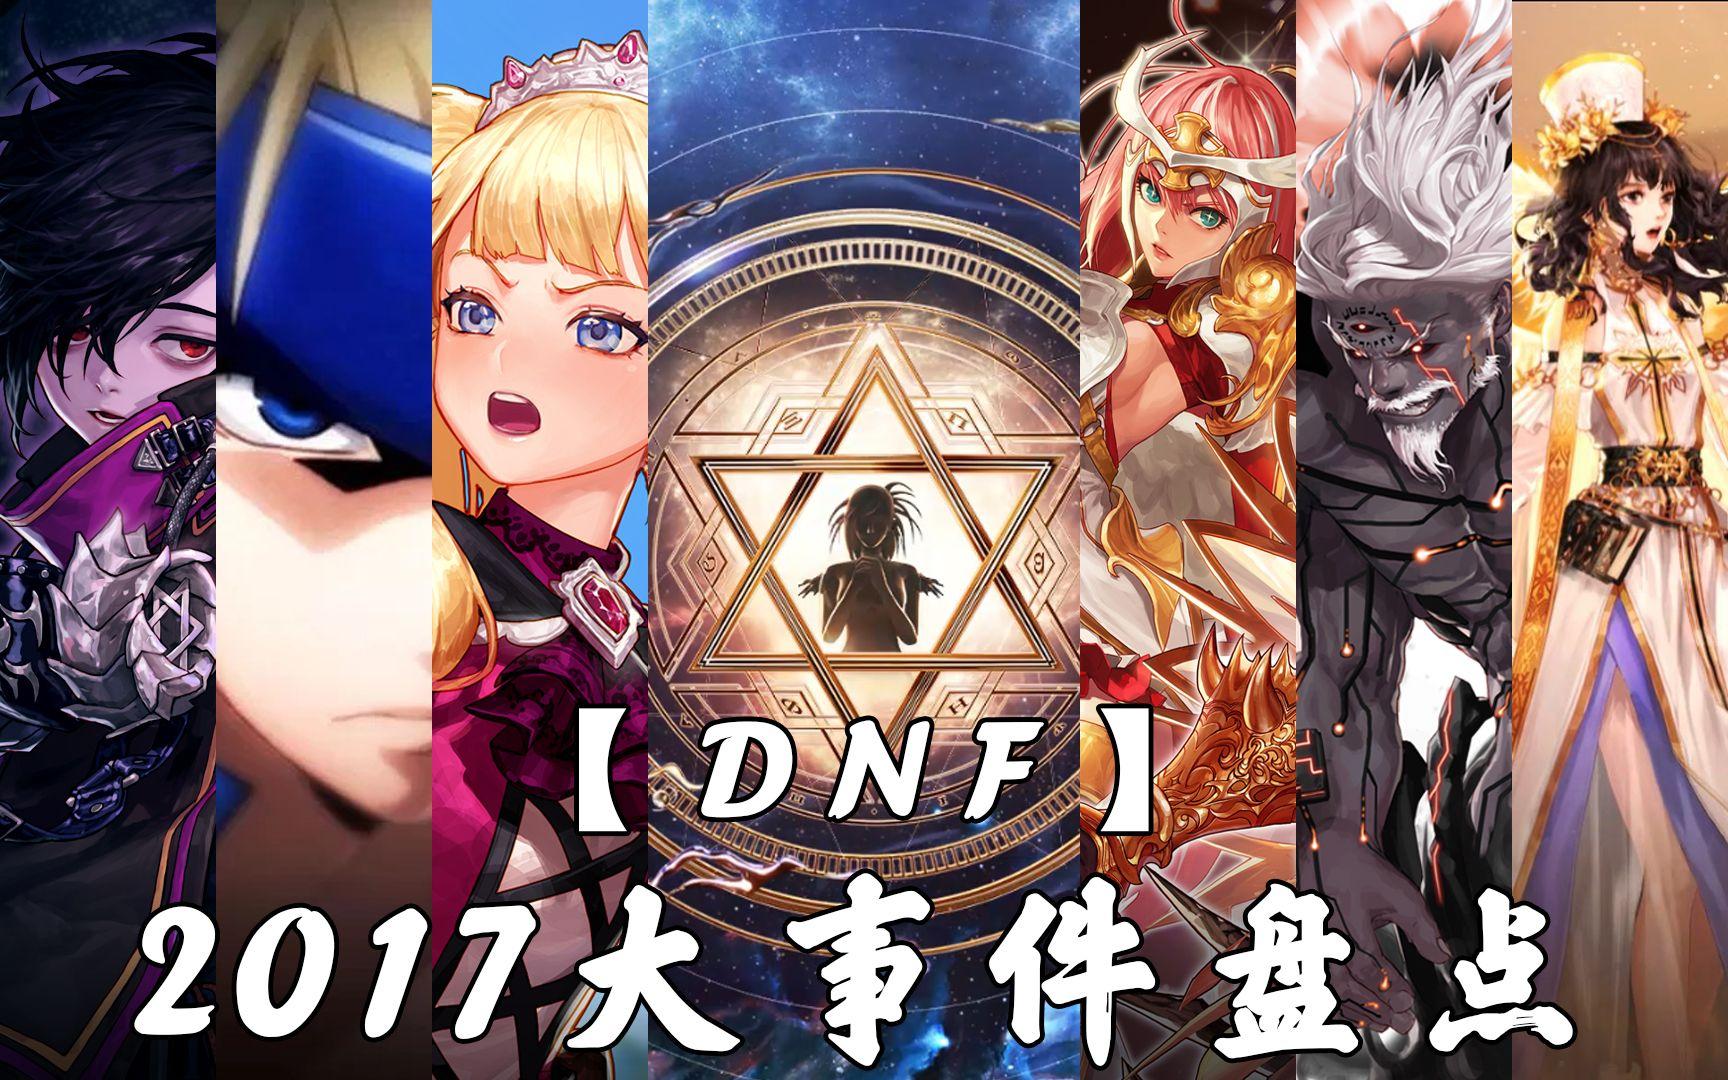 【dnf】2017大事件盘点_鬼畜调教_鬼畜_bilibili_哔哩图片